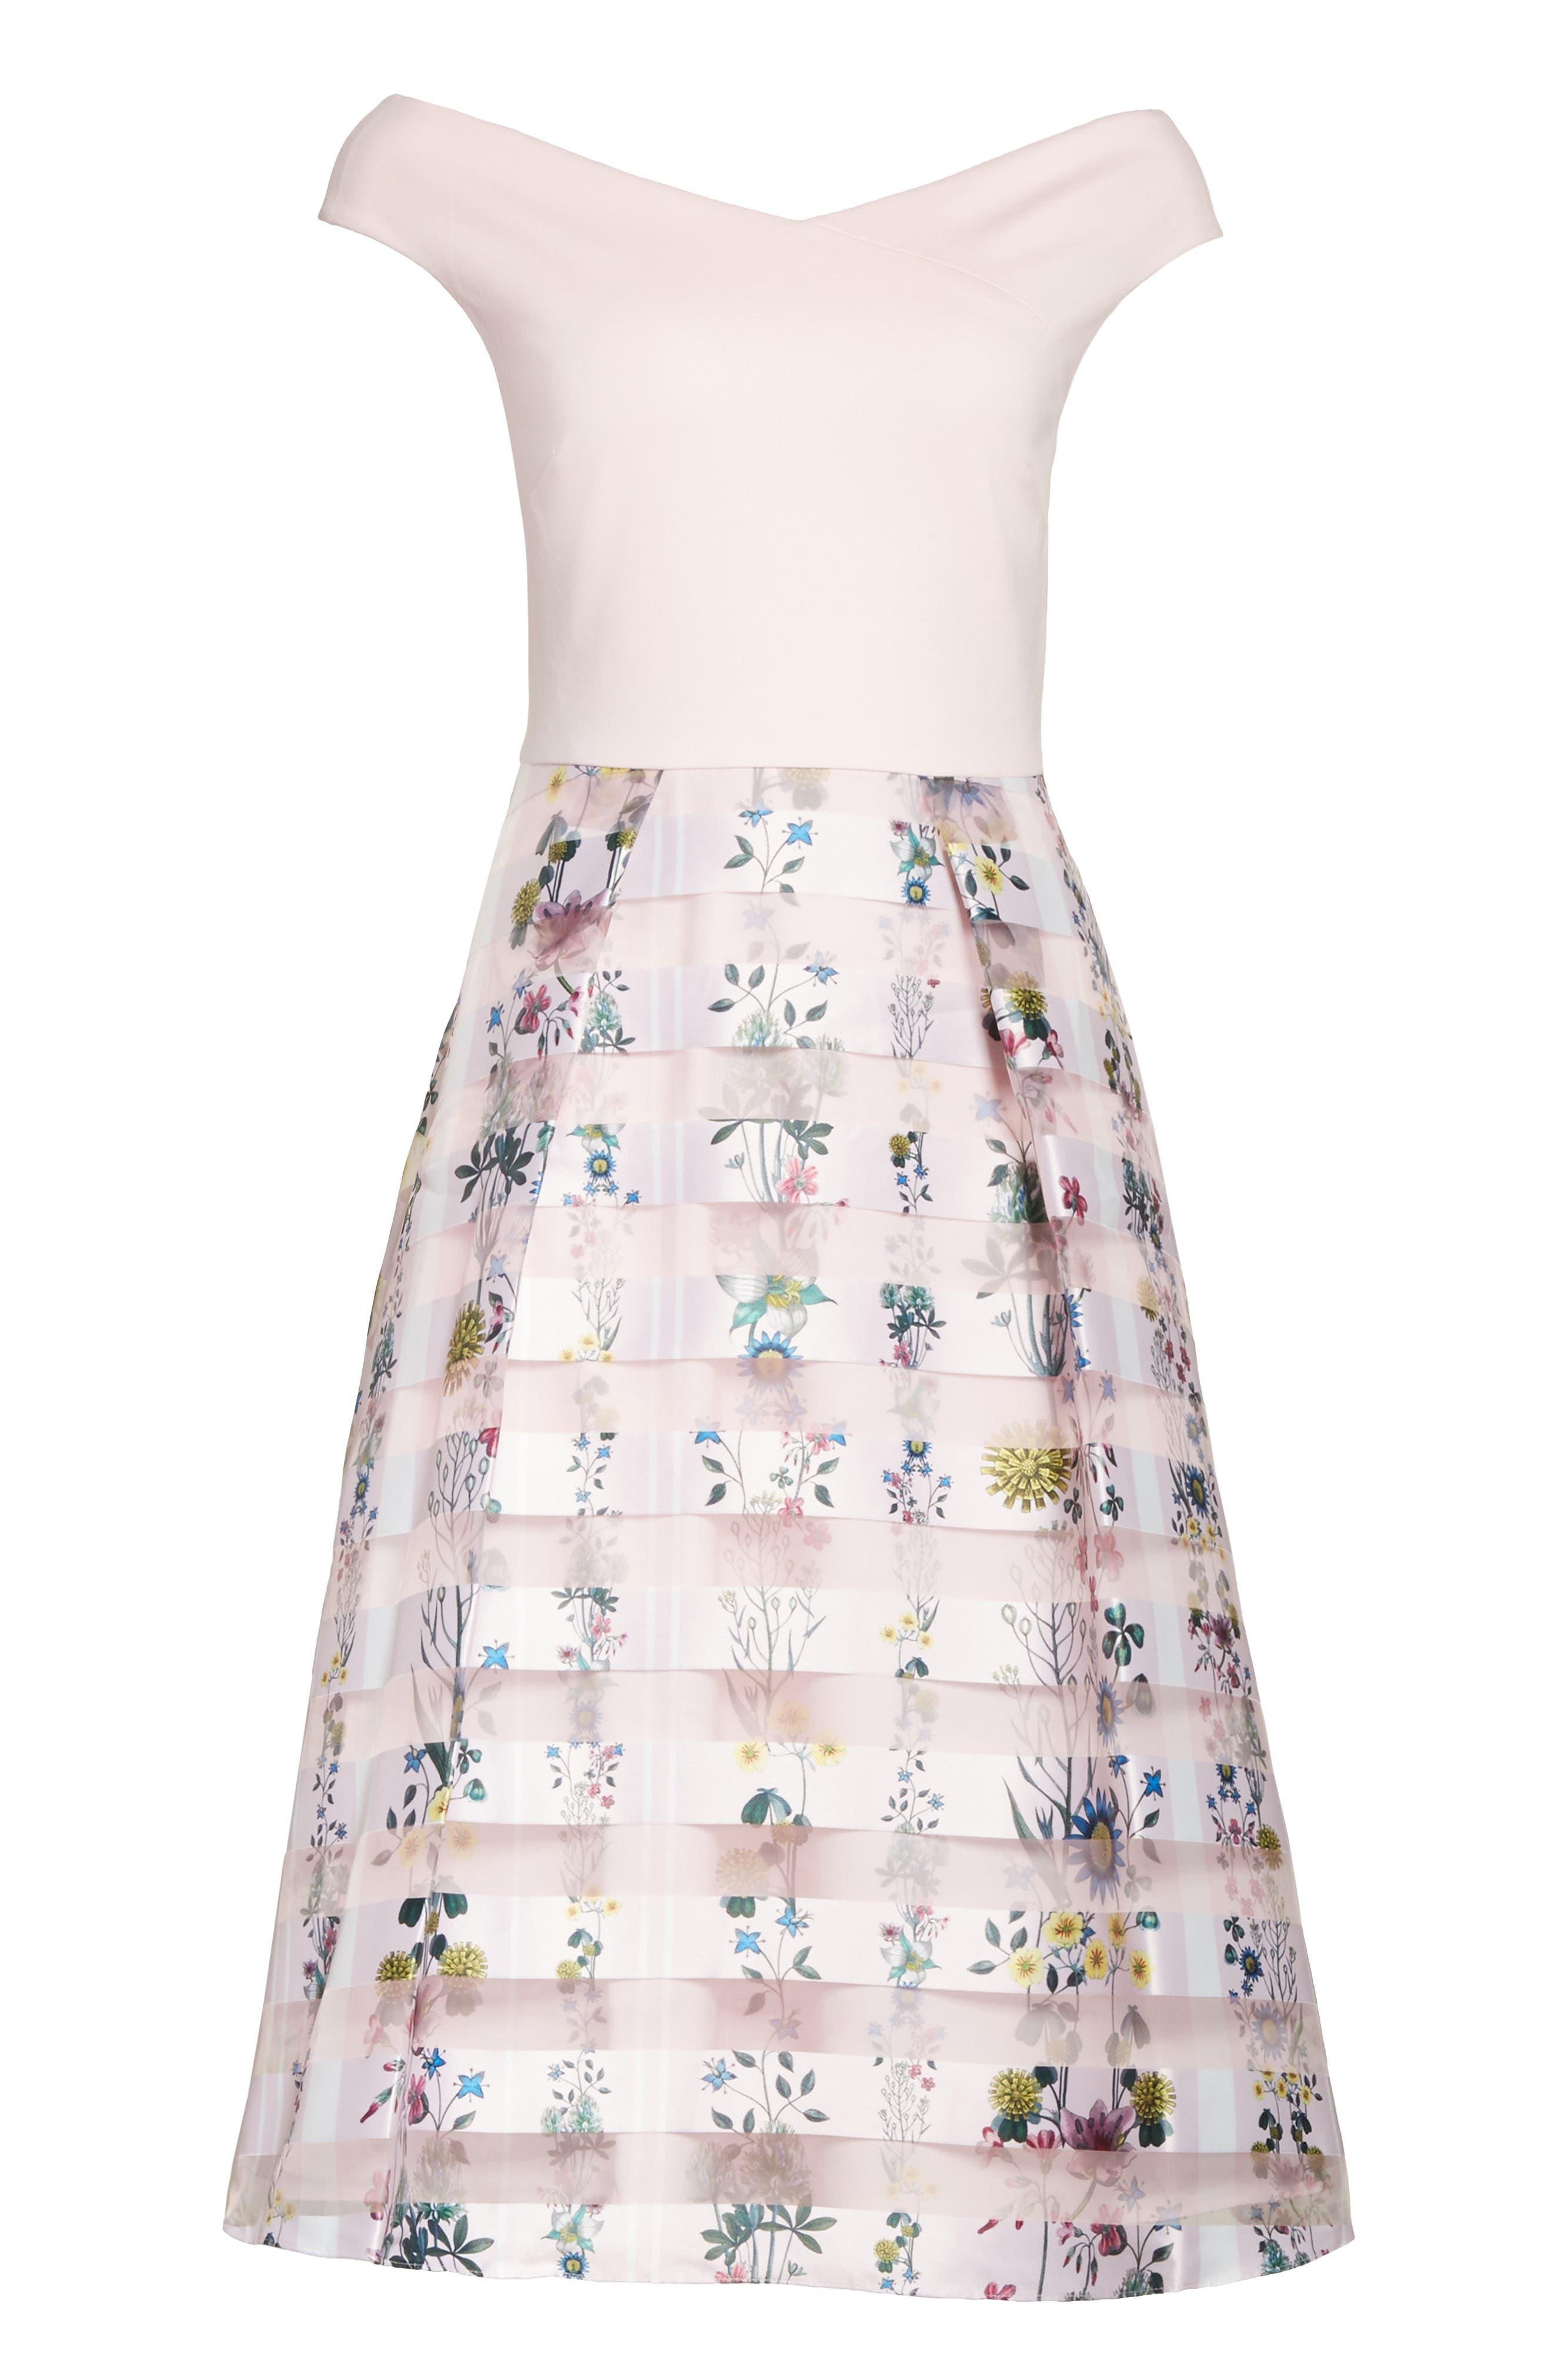 Lulou Unity Floral Off the Shoulder Dress,                             Alternate thumbnail 6, color,                             672